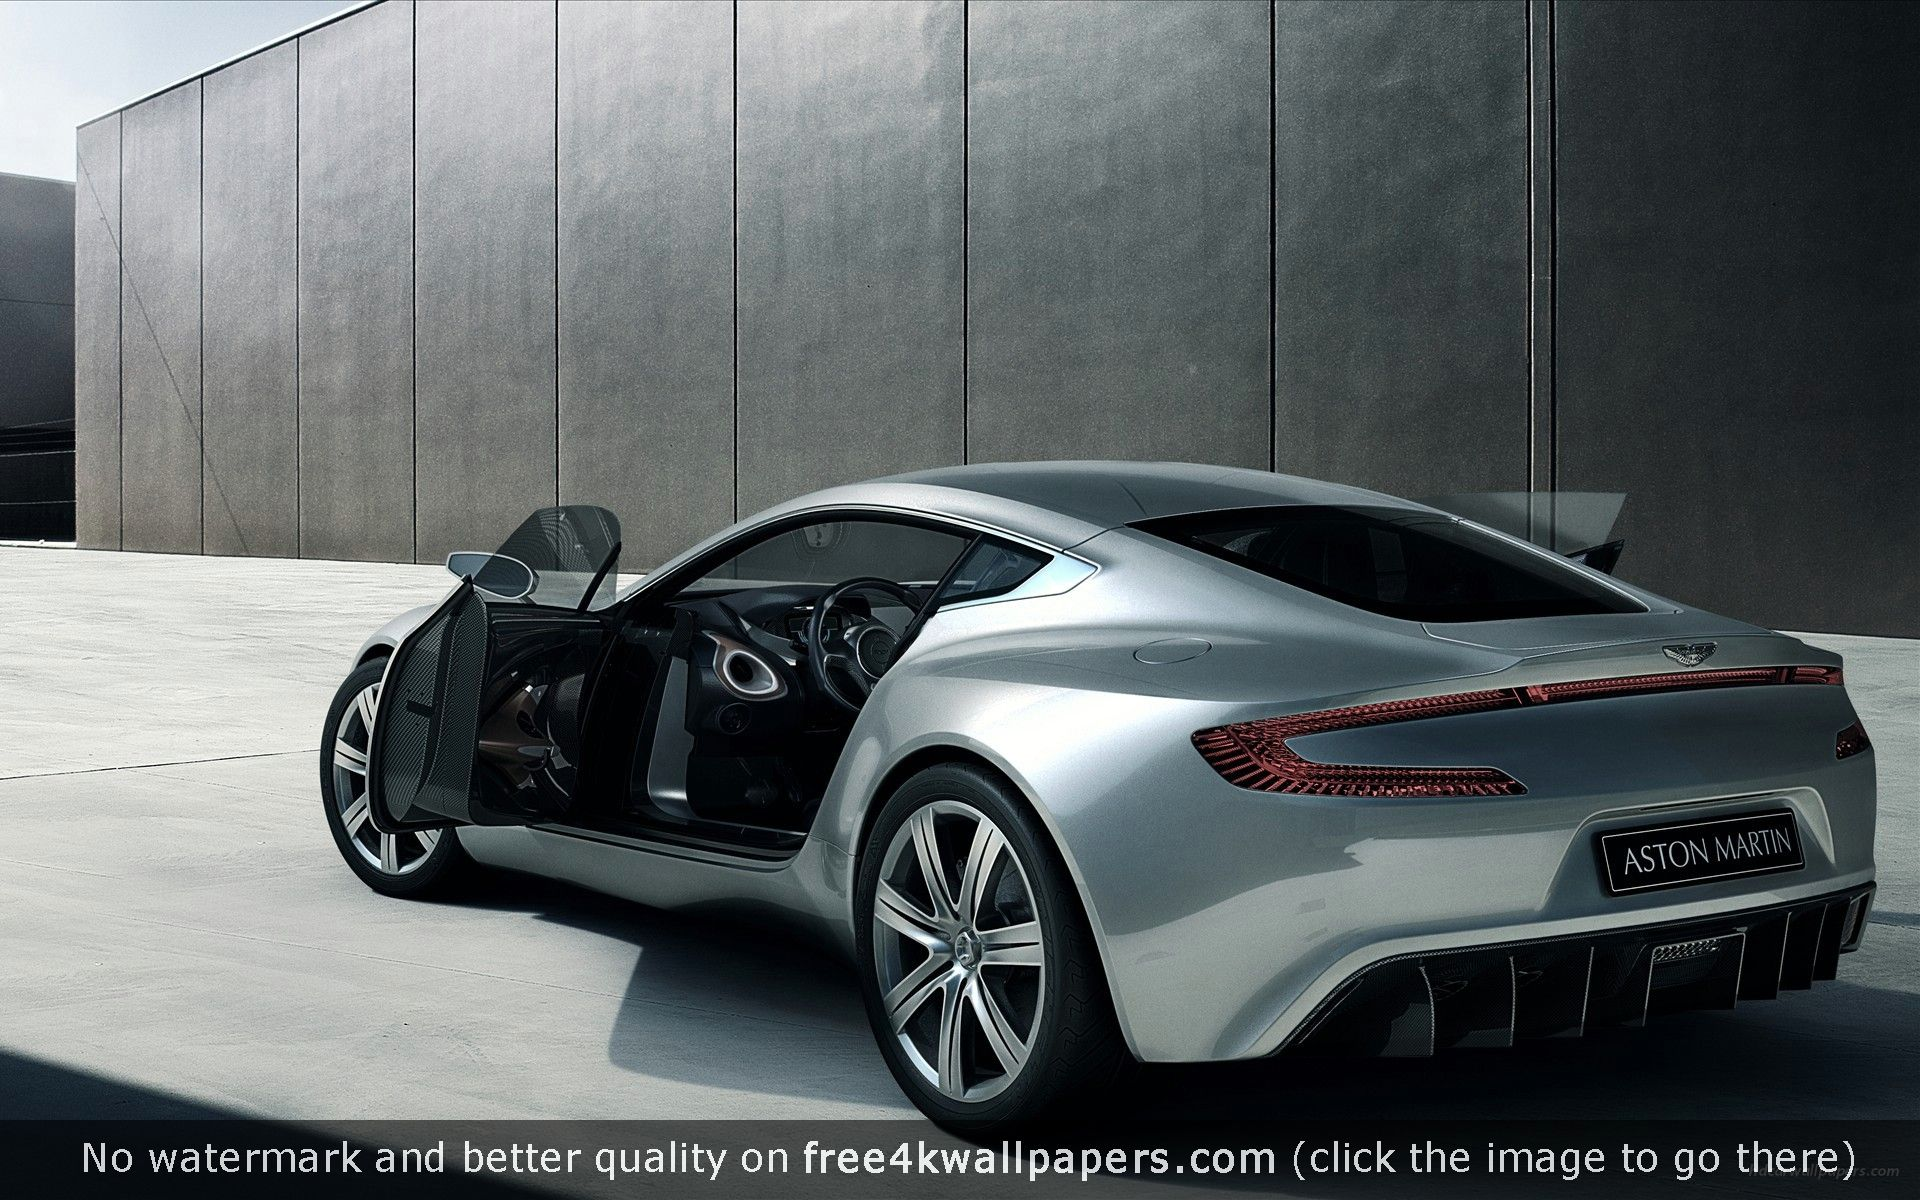 Aston martin one 2 hd wallpaper download aston martin one 2 hd wallpaper for your